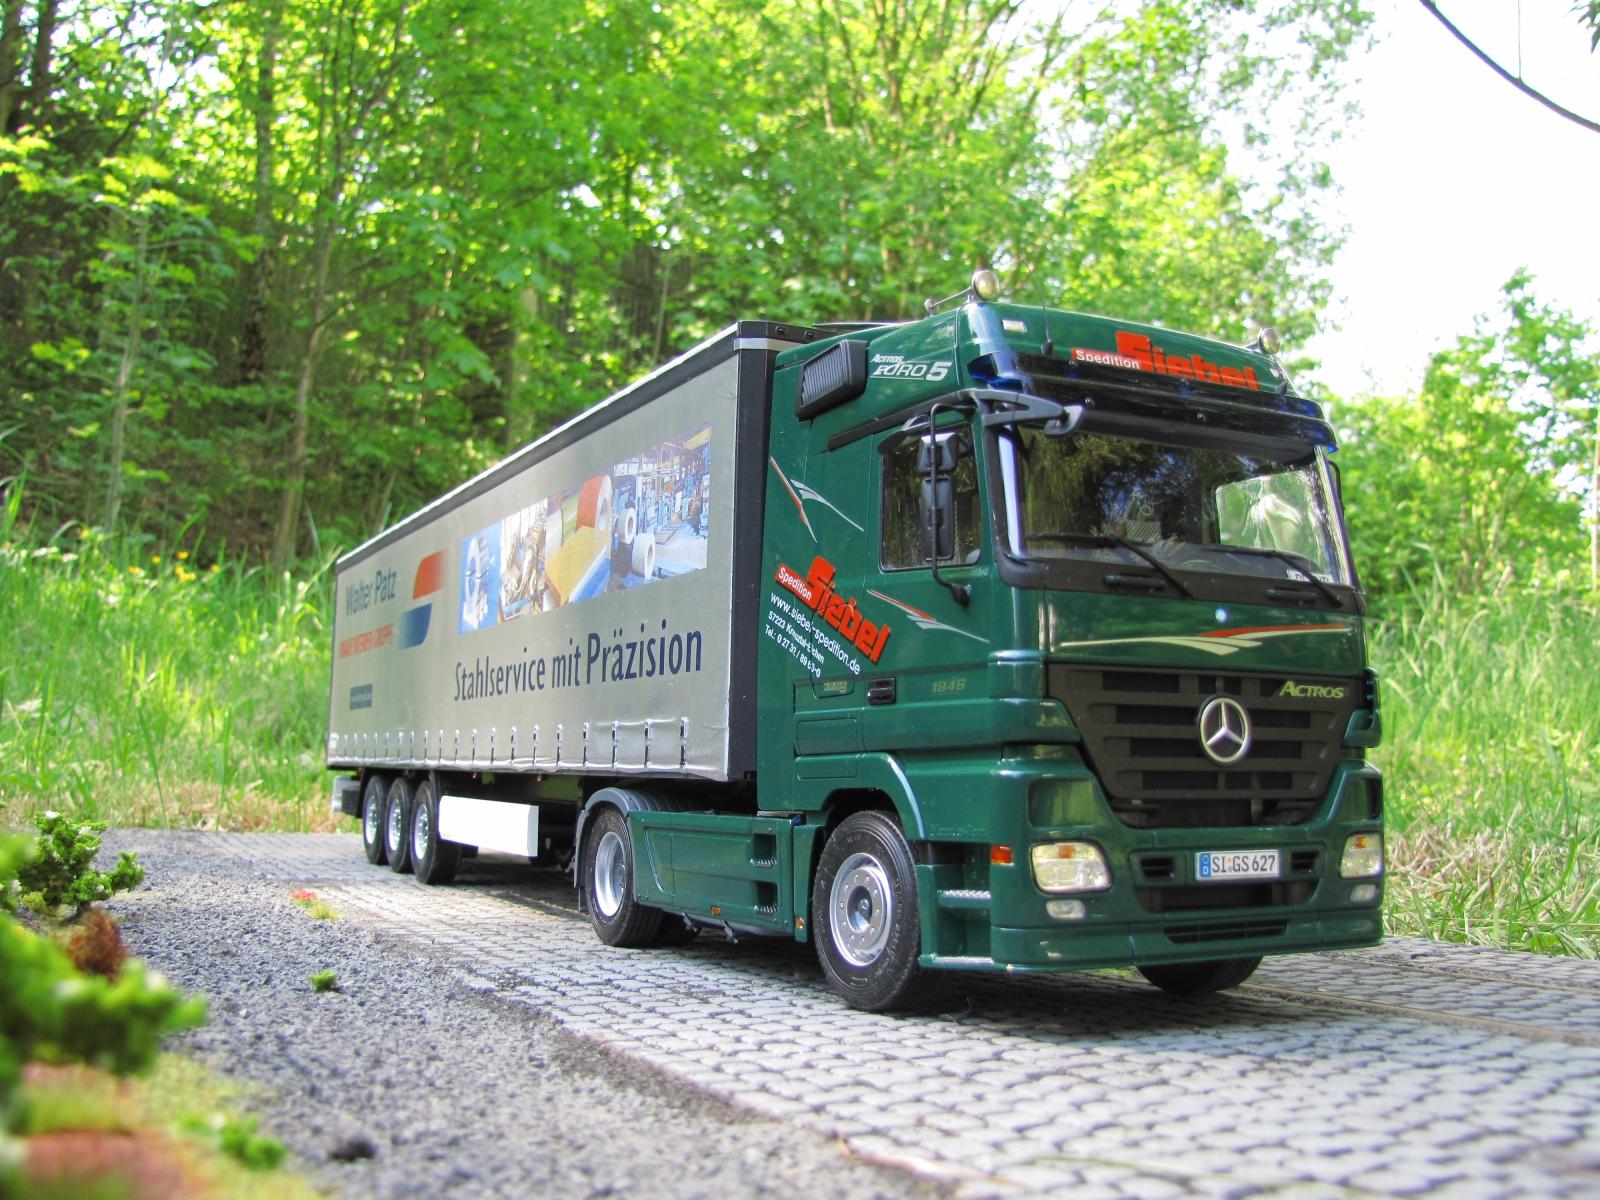 Грузовики Германии фото   Фотоальбом Швейцарии и Германии f7904b7f29d